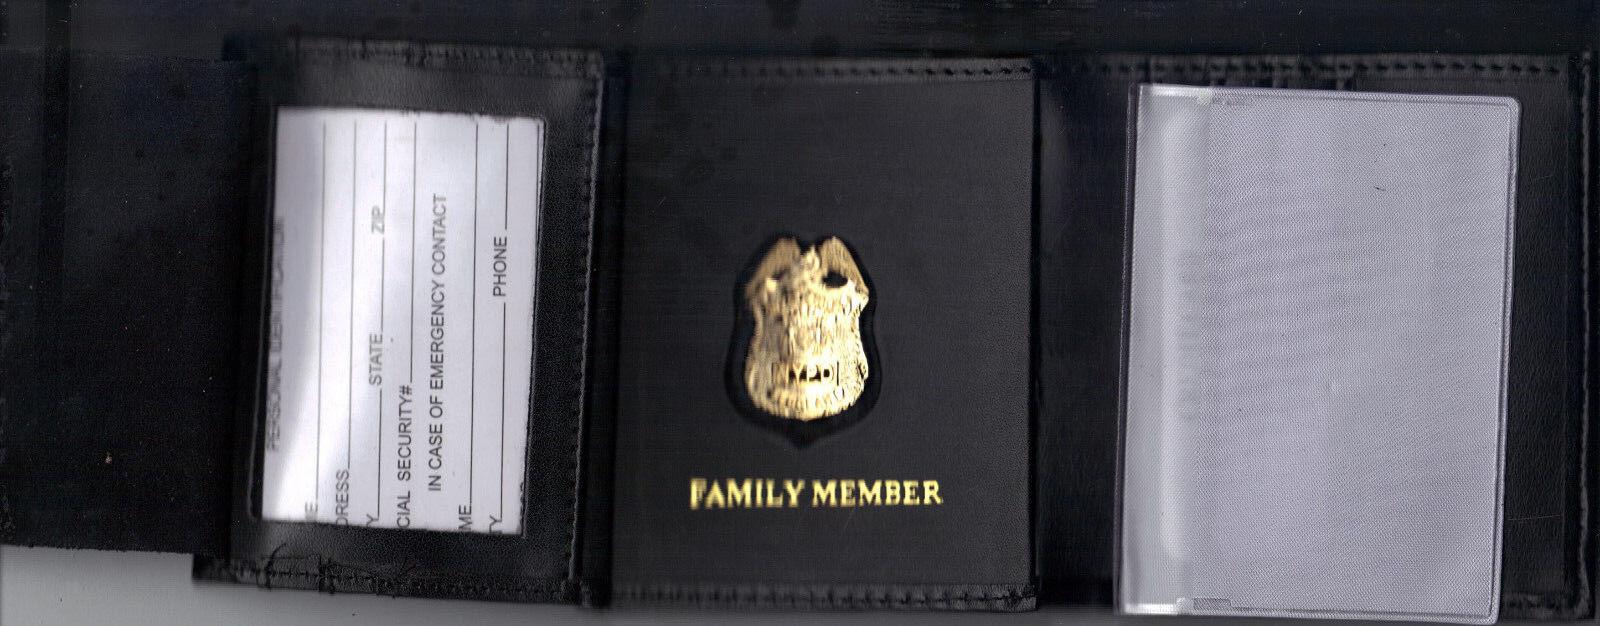 1-inch Mini Detective Tri-Fold money//CC Wallet CT09 NY//NJ Police-Style